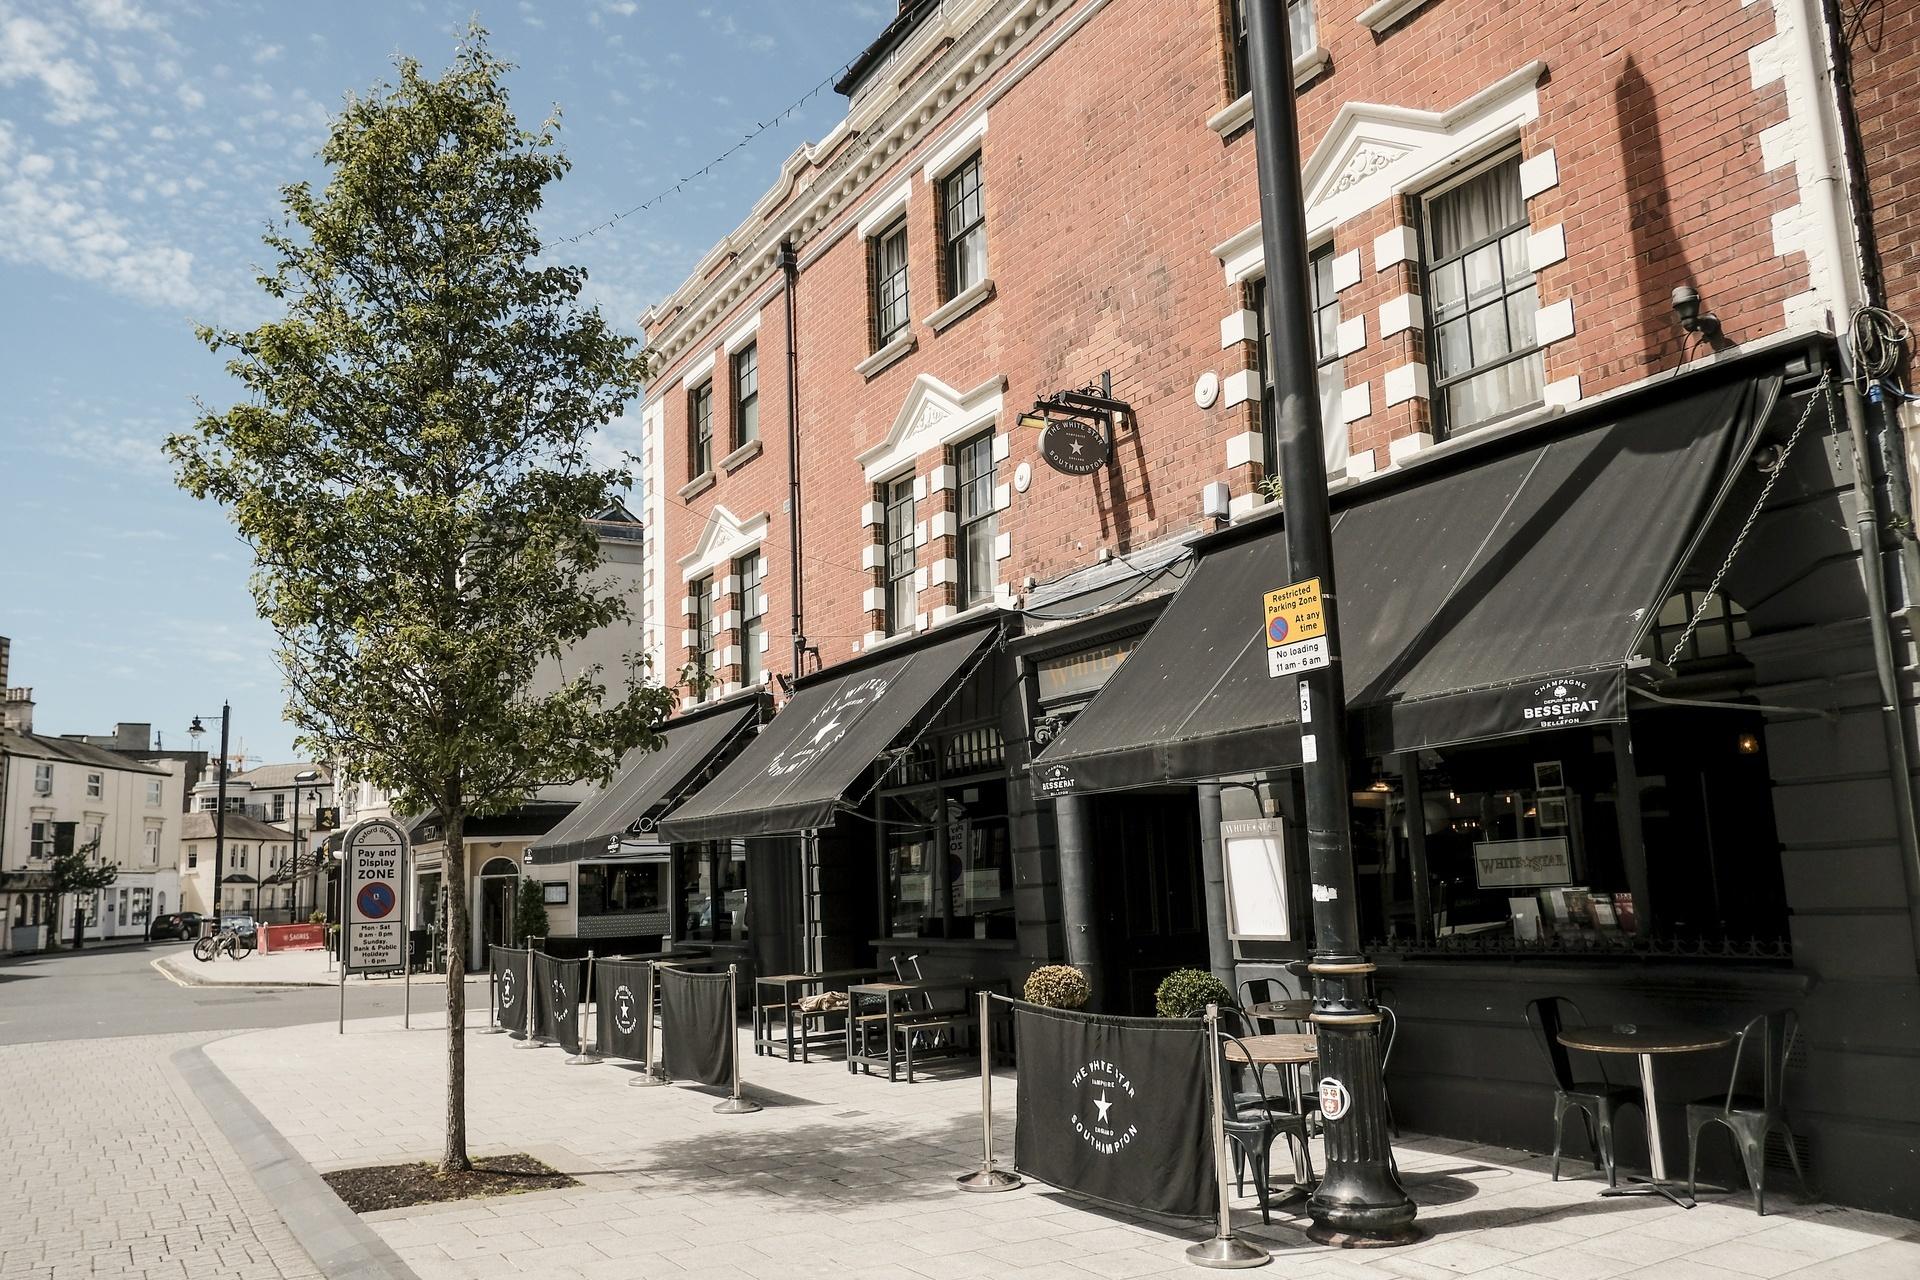 The White Star Tavern [Accommodation]